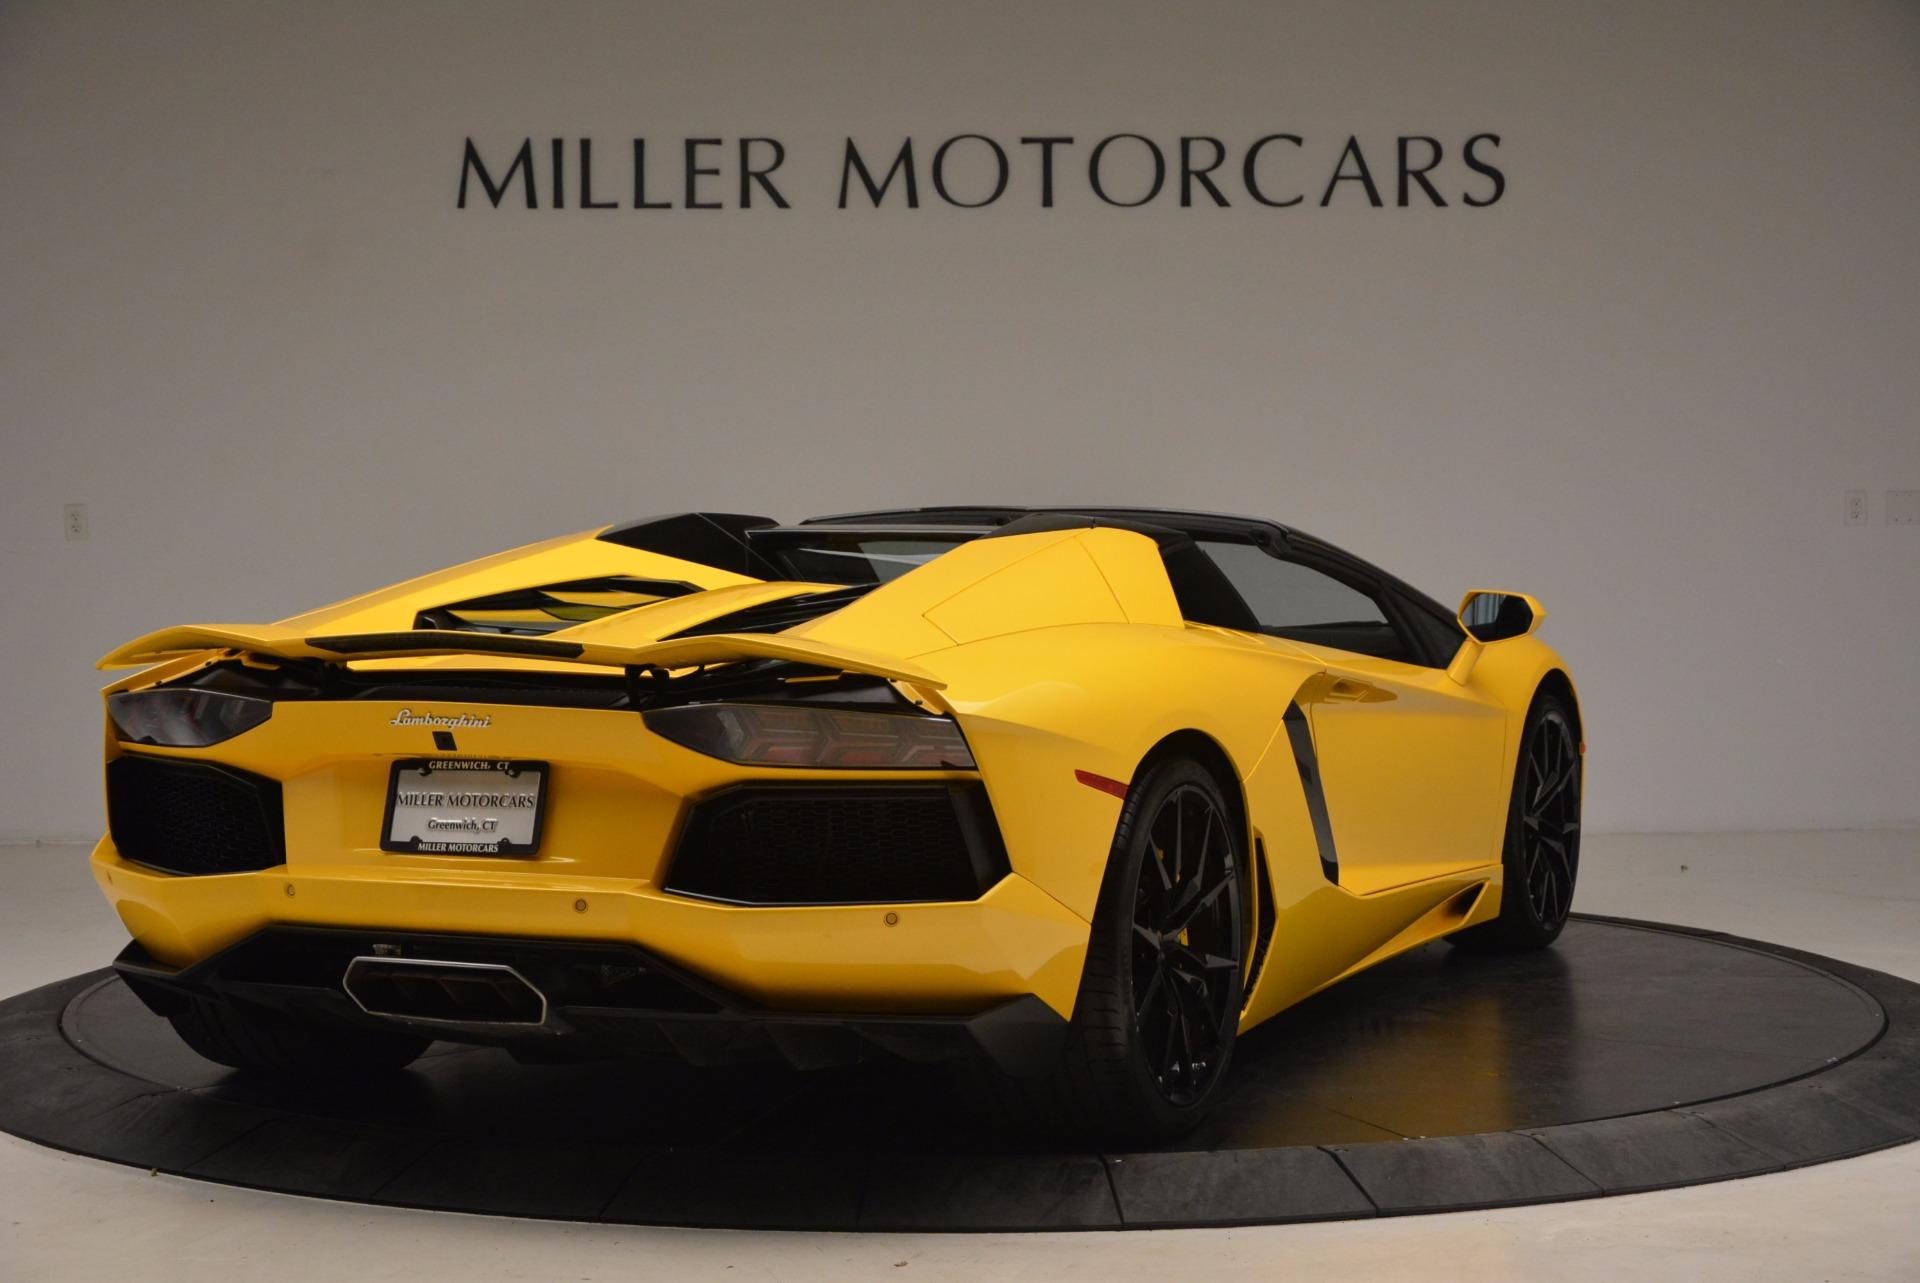 Used 2015 Lamborghini Aventador LP 700-4 Roadster   Greenwich, CT